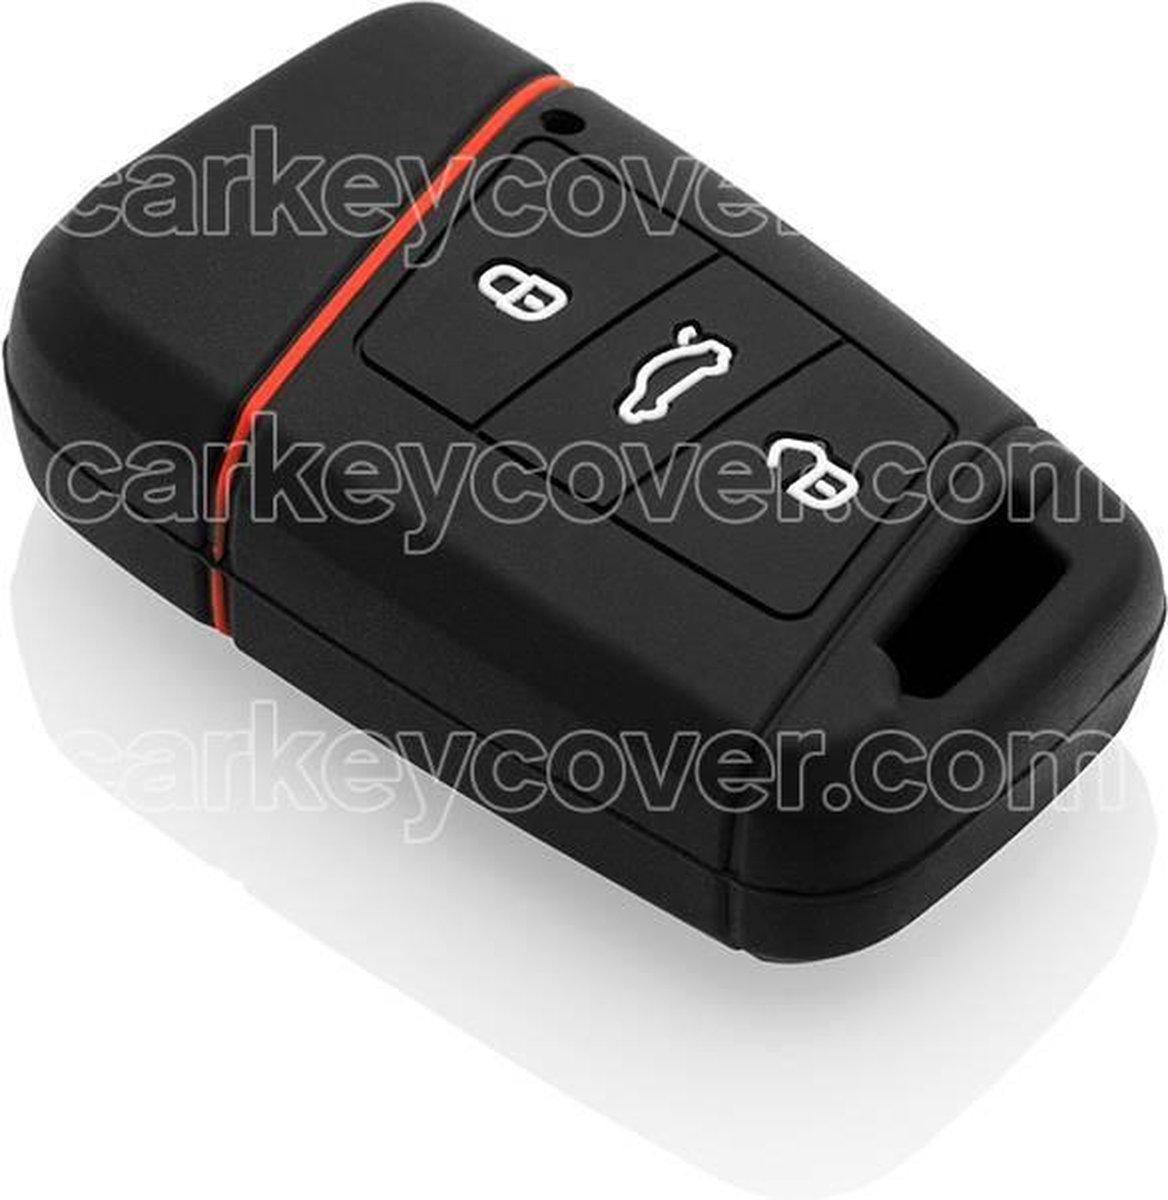 Volkswagen SleutelCover - Zwart / Silicone sleutelhoesje / beschermhoesje autosleutel